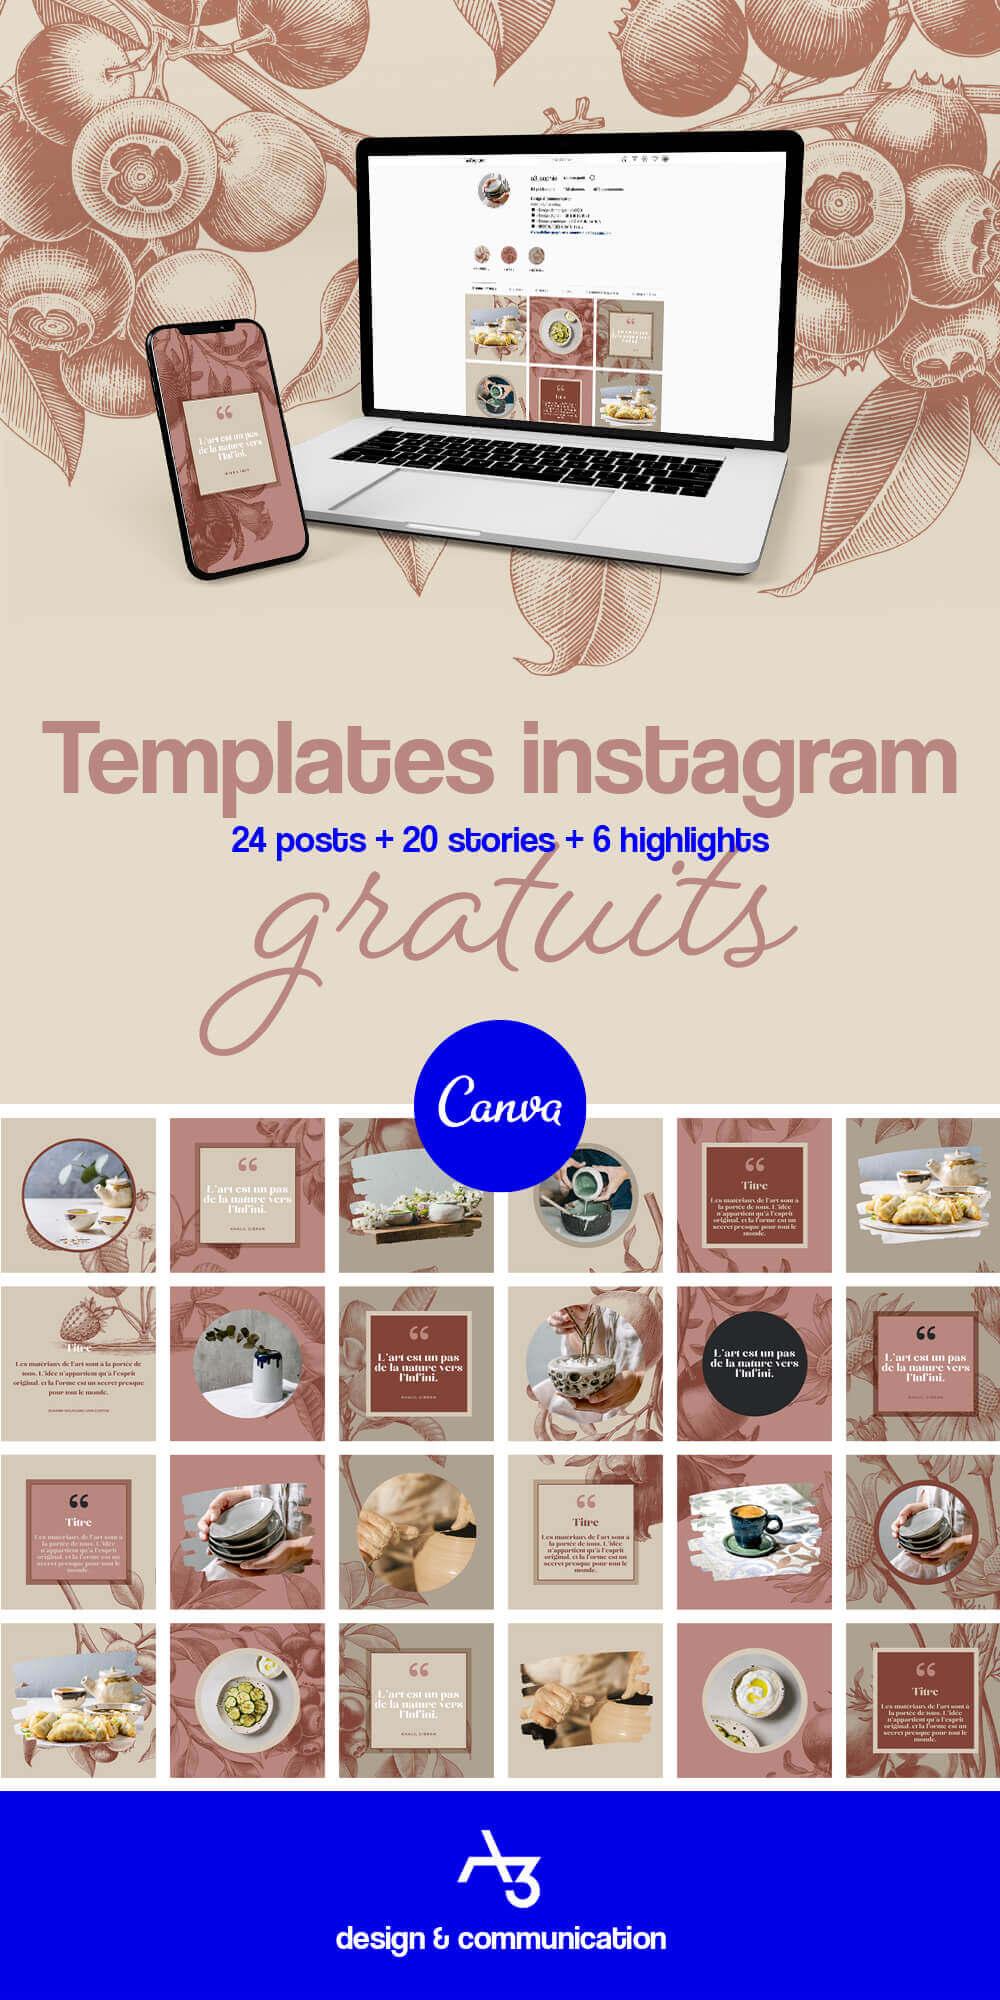 Templates instagram gratuits